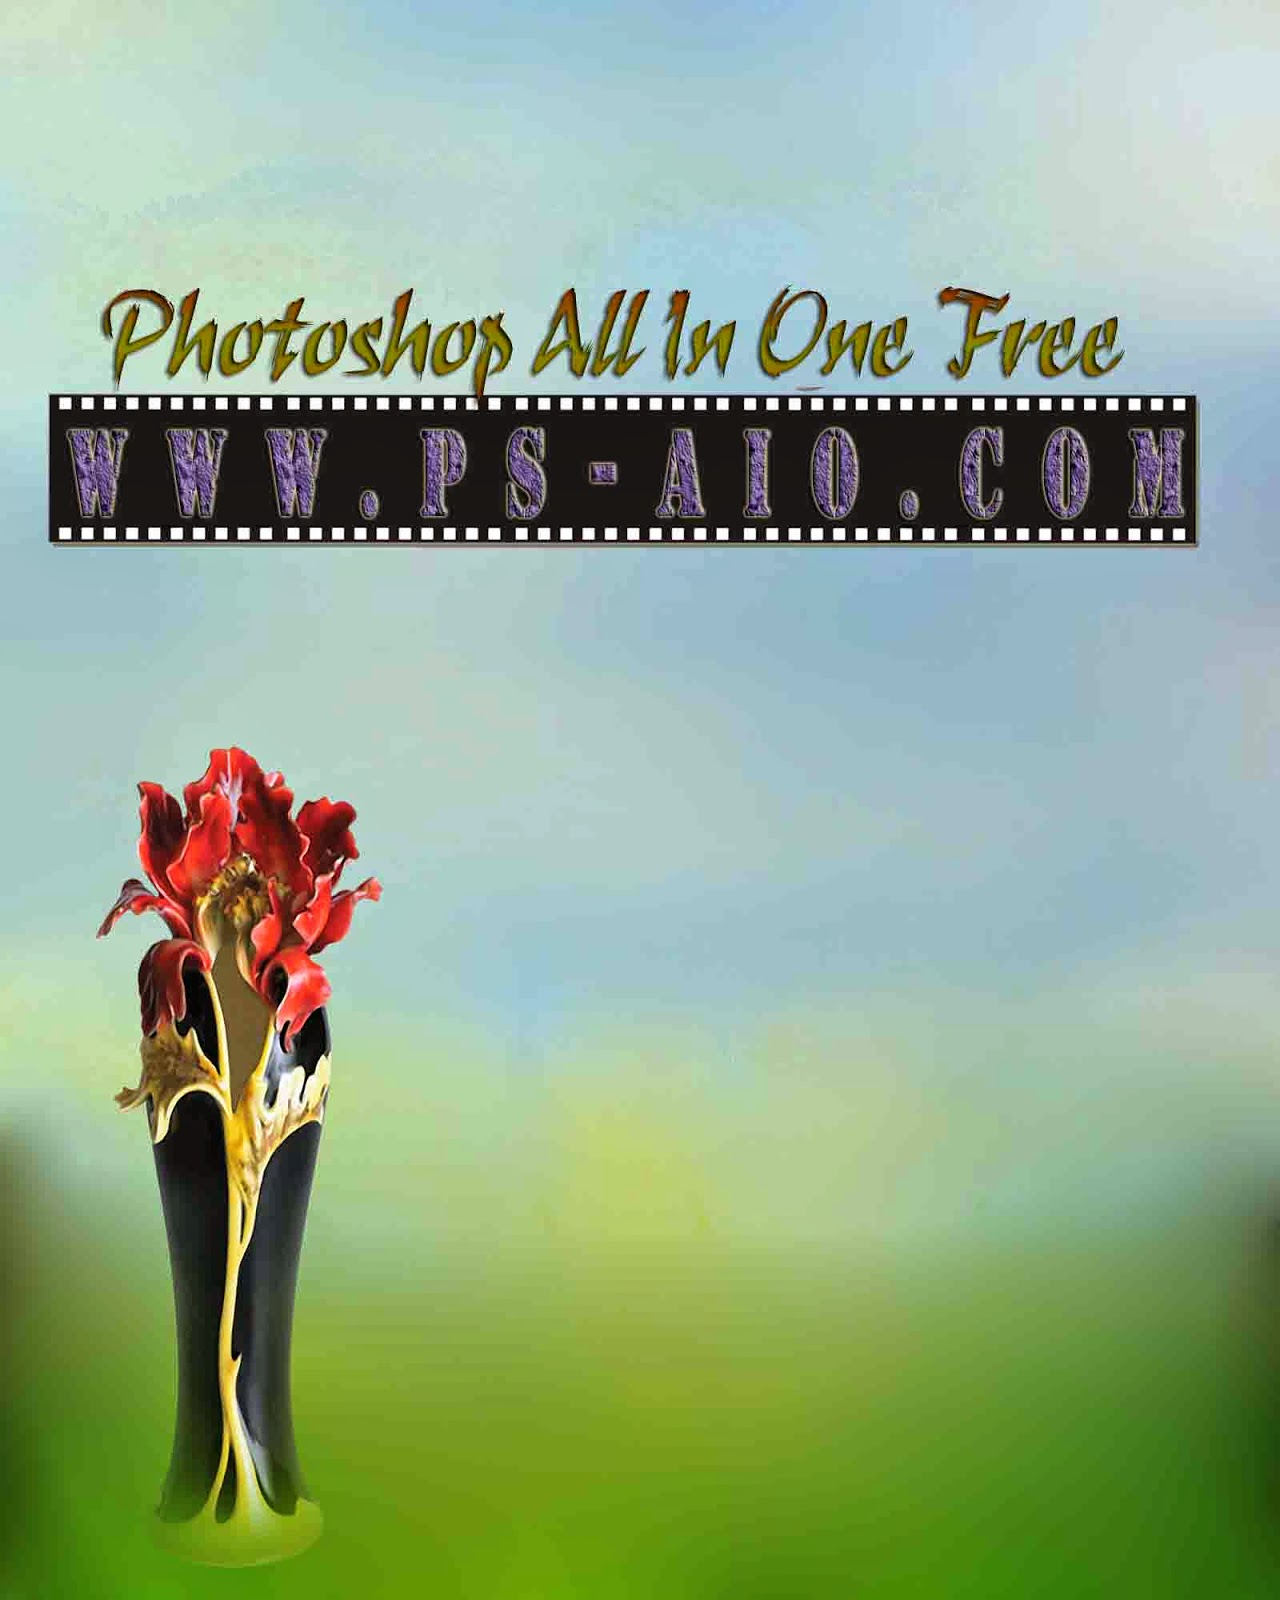 photoshop digital studio background psd collection free